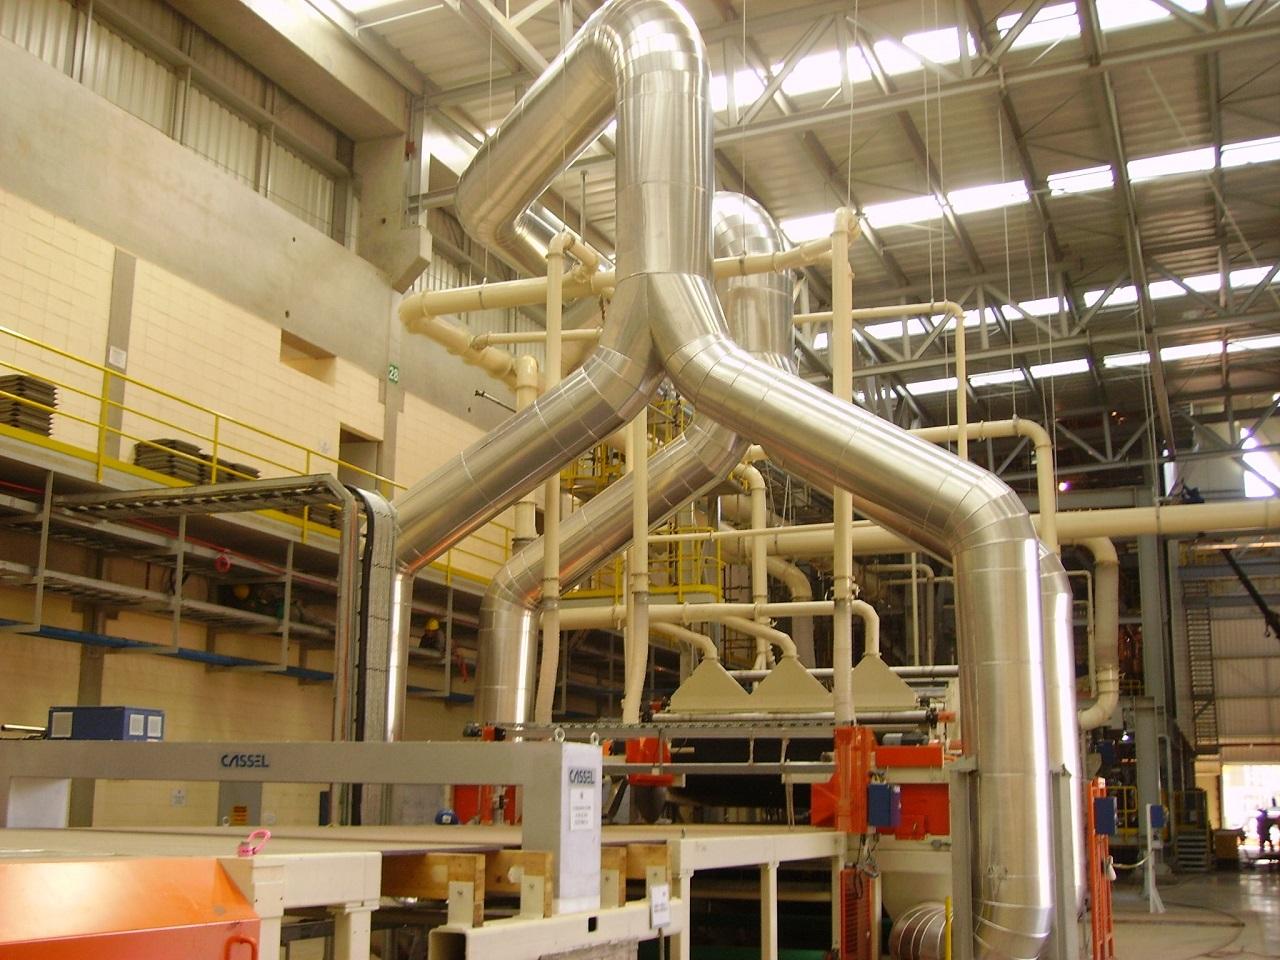 Isolamento termico Industrial de Transportador Pneumático